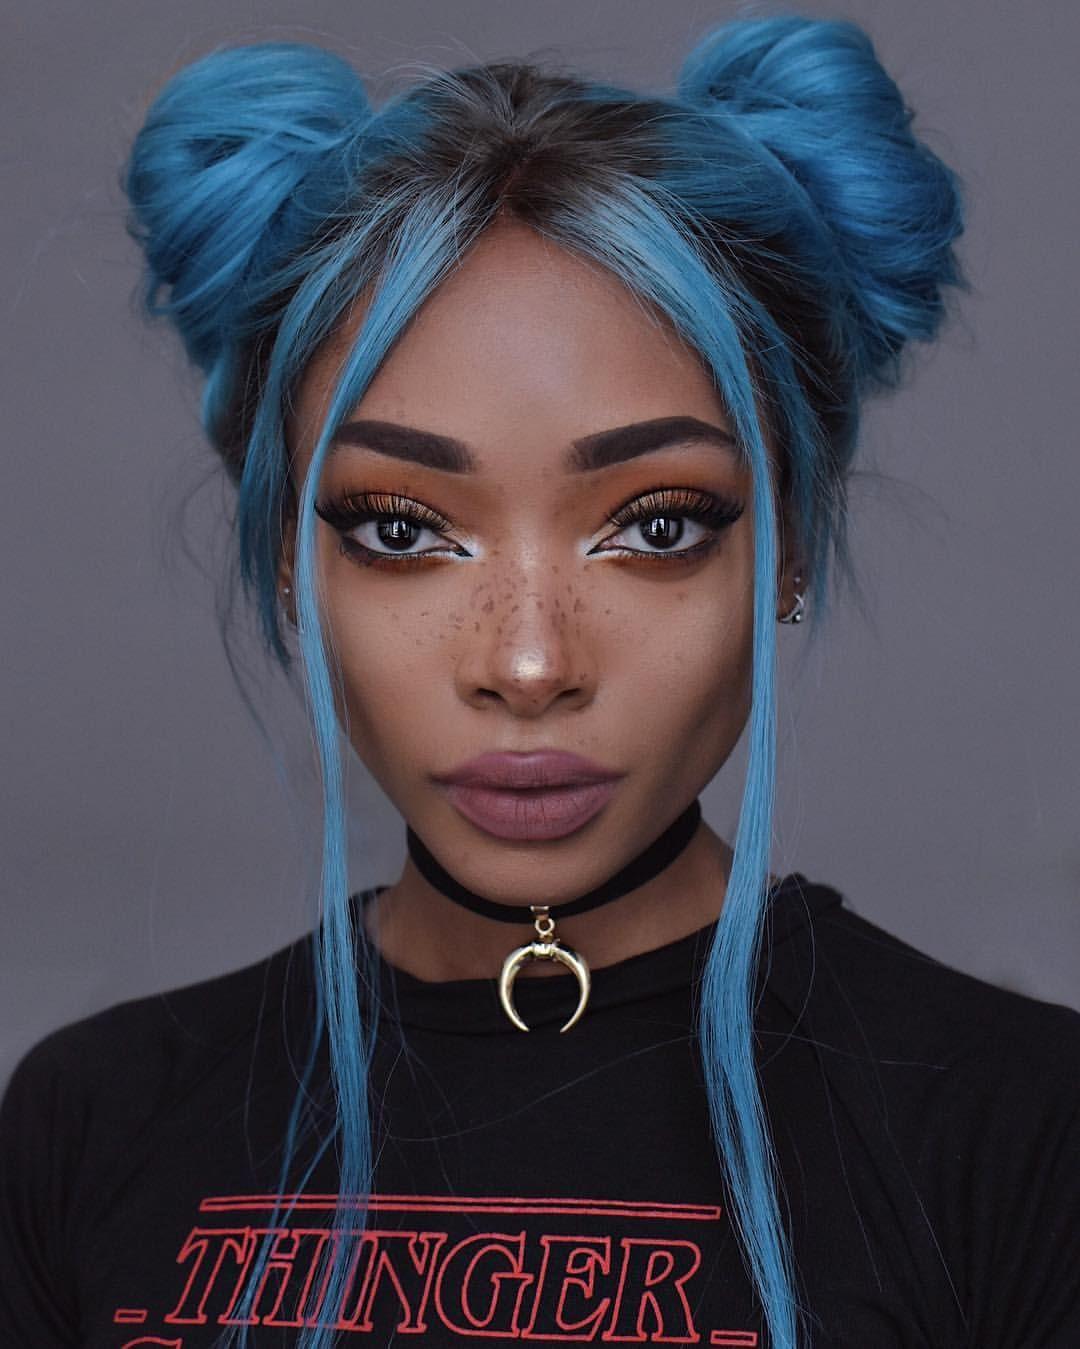 Nyane Lebajoa No Instagram Blue Hair Just For Now The Pink Hair Will Be Back Hair Princesshairshop Choker Lamo Hair Styles Blue Hair Trendy Hairstyles